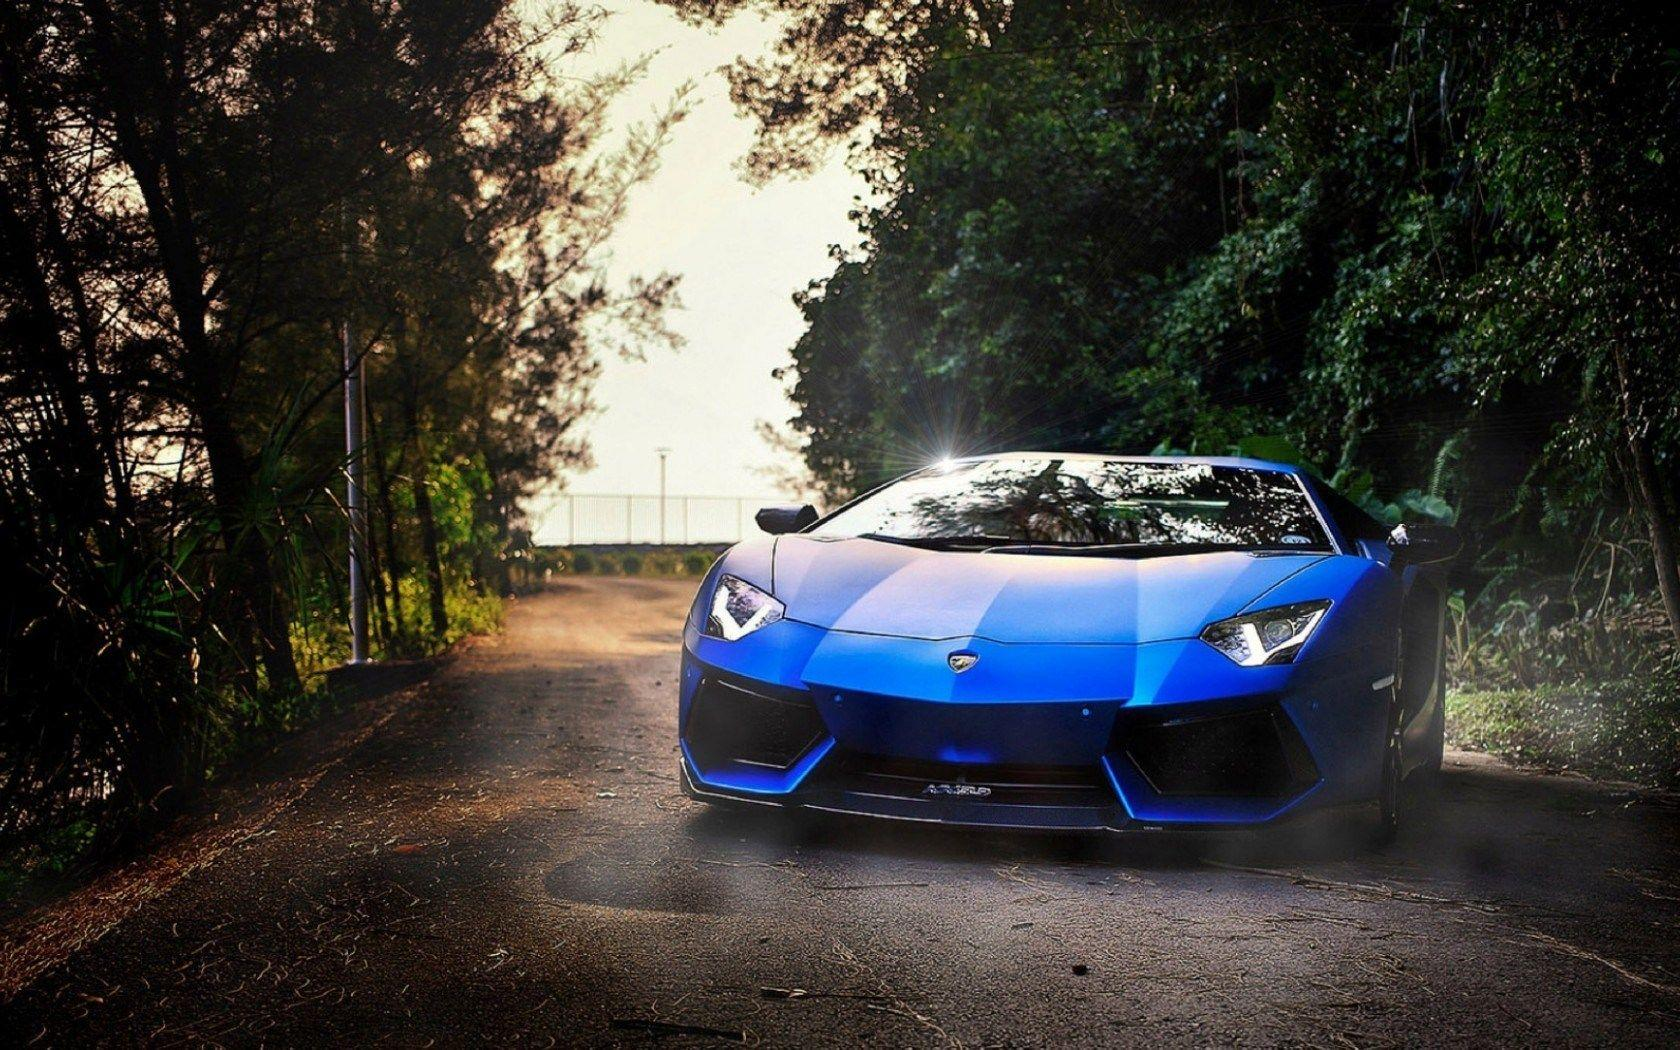 Lamborghini Aventador On Morning Wallpaper